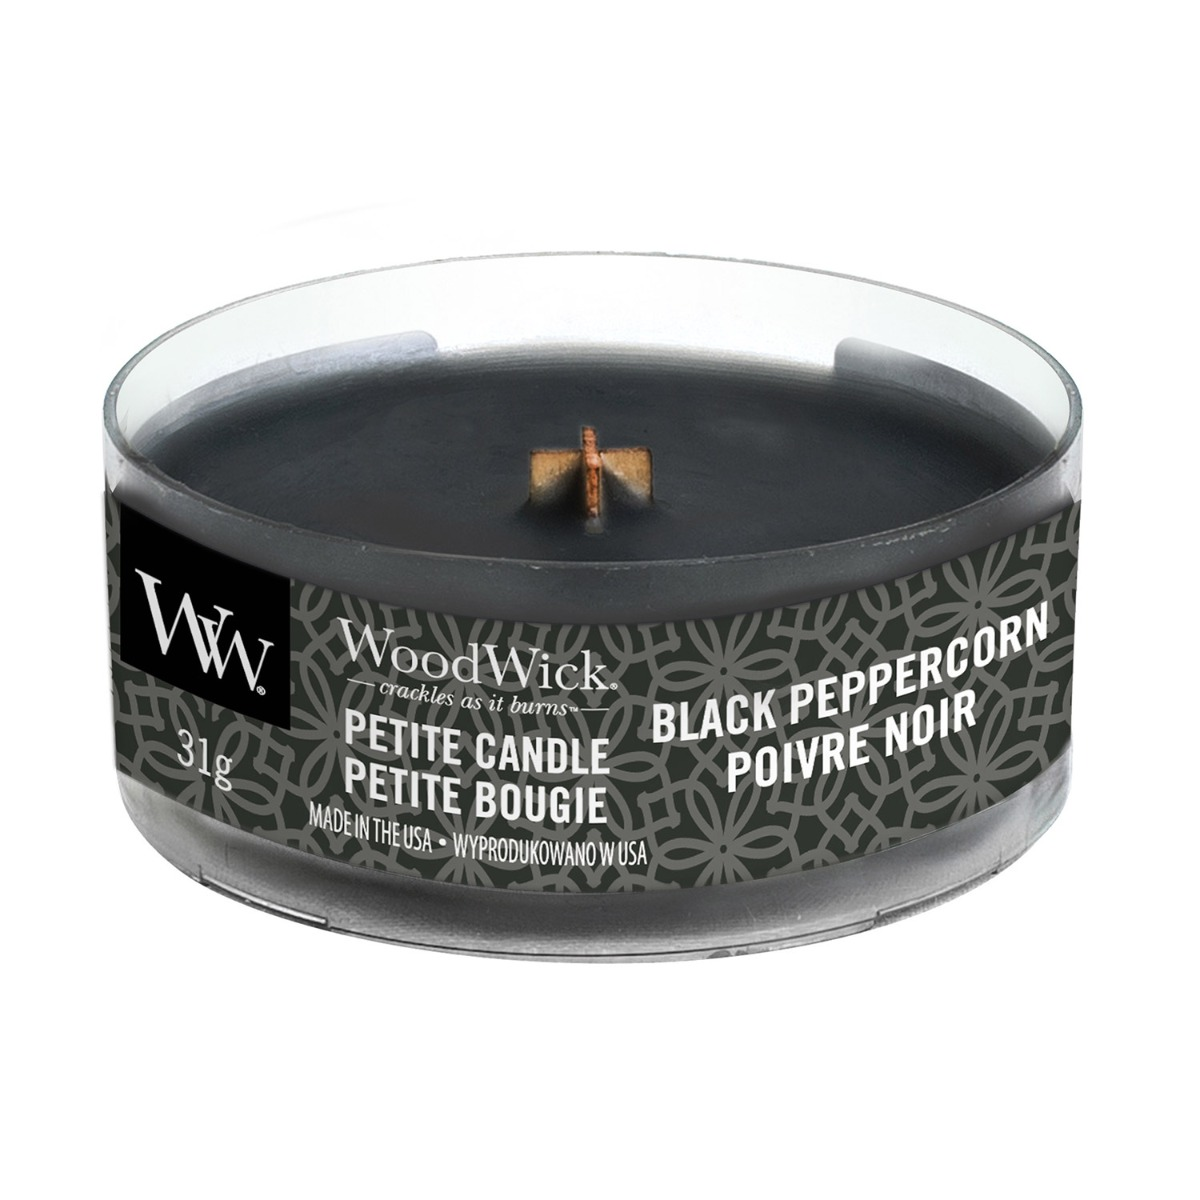 WoodWick Black Peppercorn Petite Candle